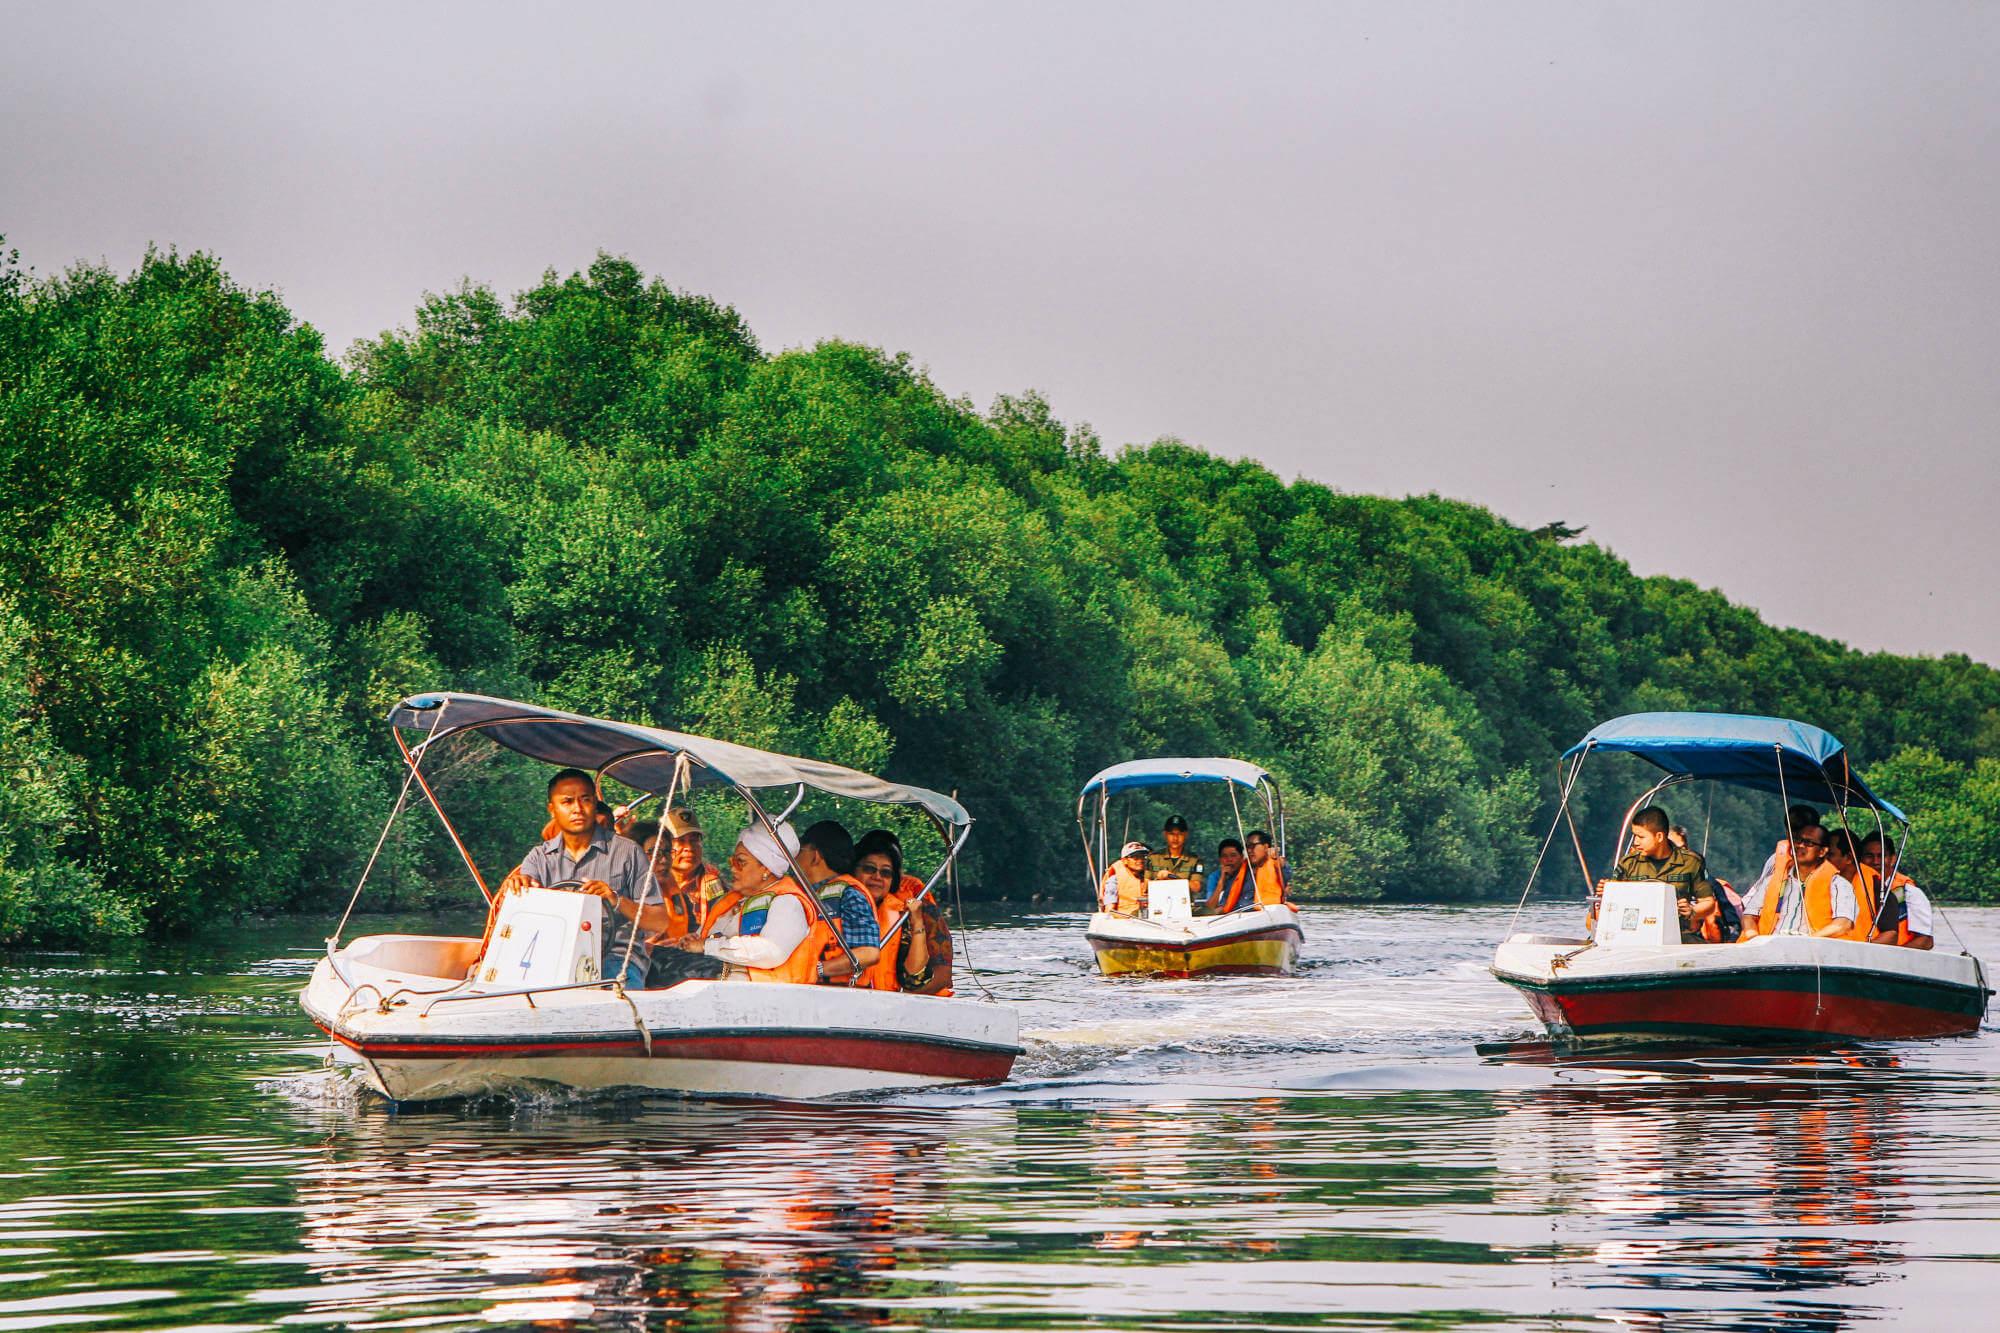 Taman Wisata Alam Twa Angke Kapuk